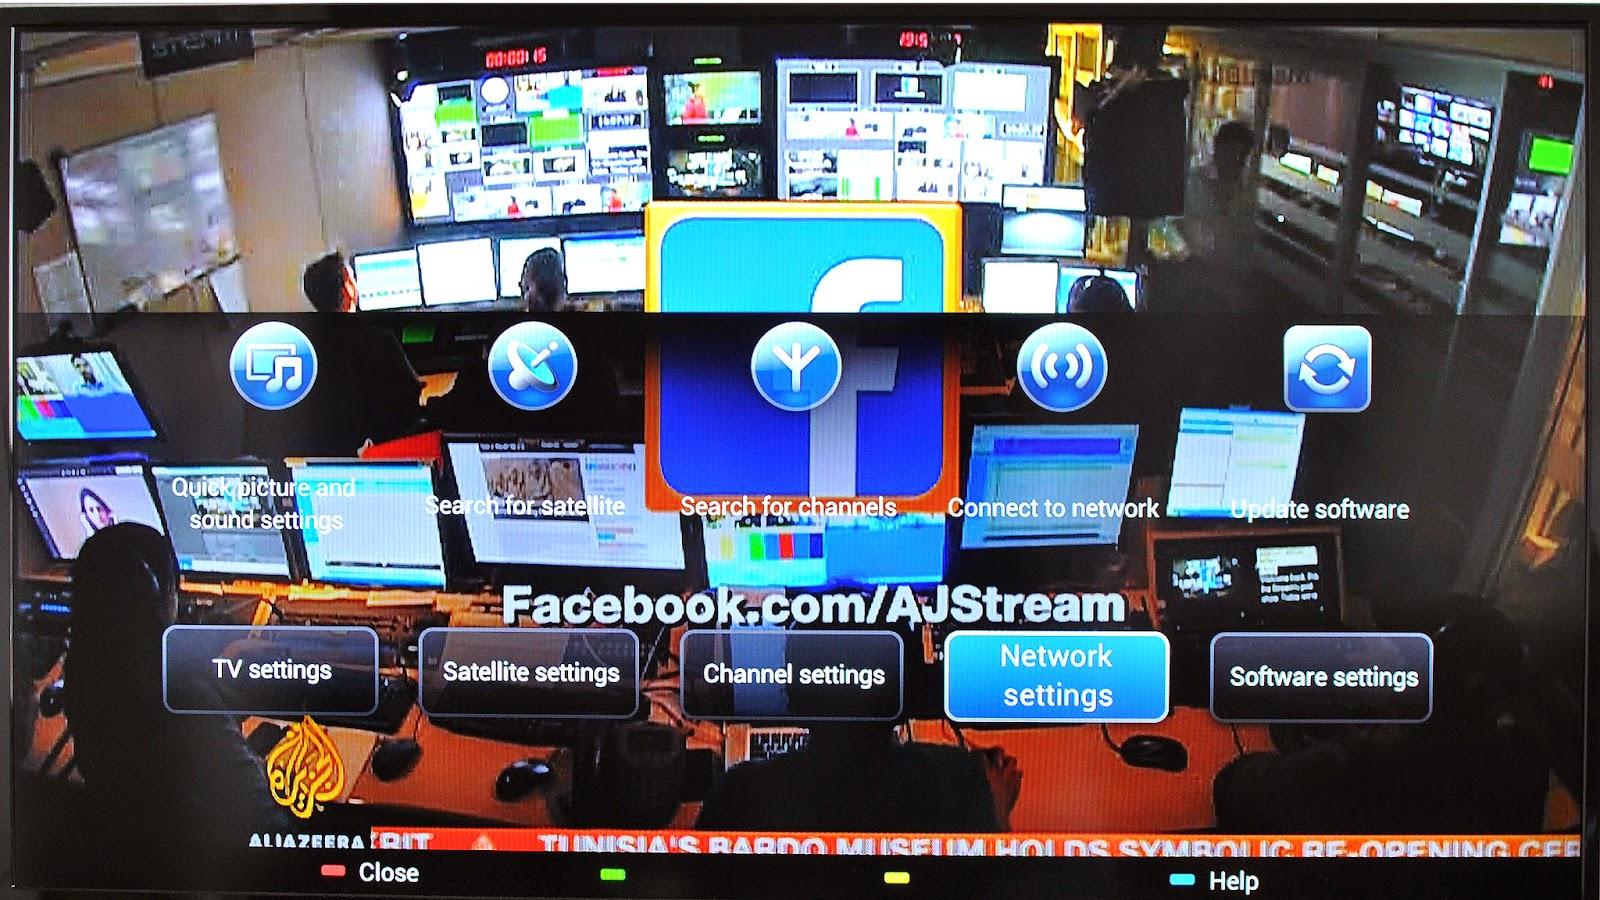 SmartTV%2BPhilips%2BSetup%2BNetwork%2BSe